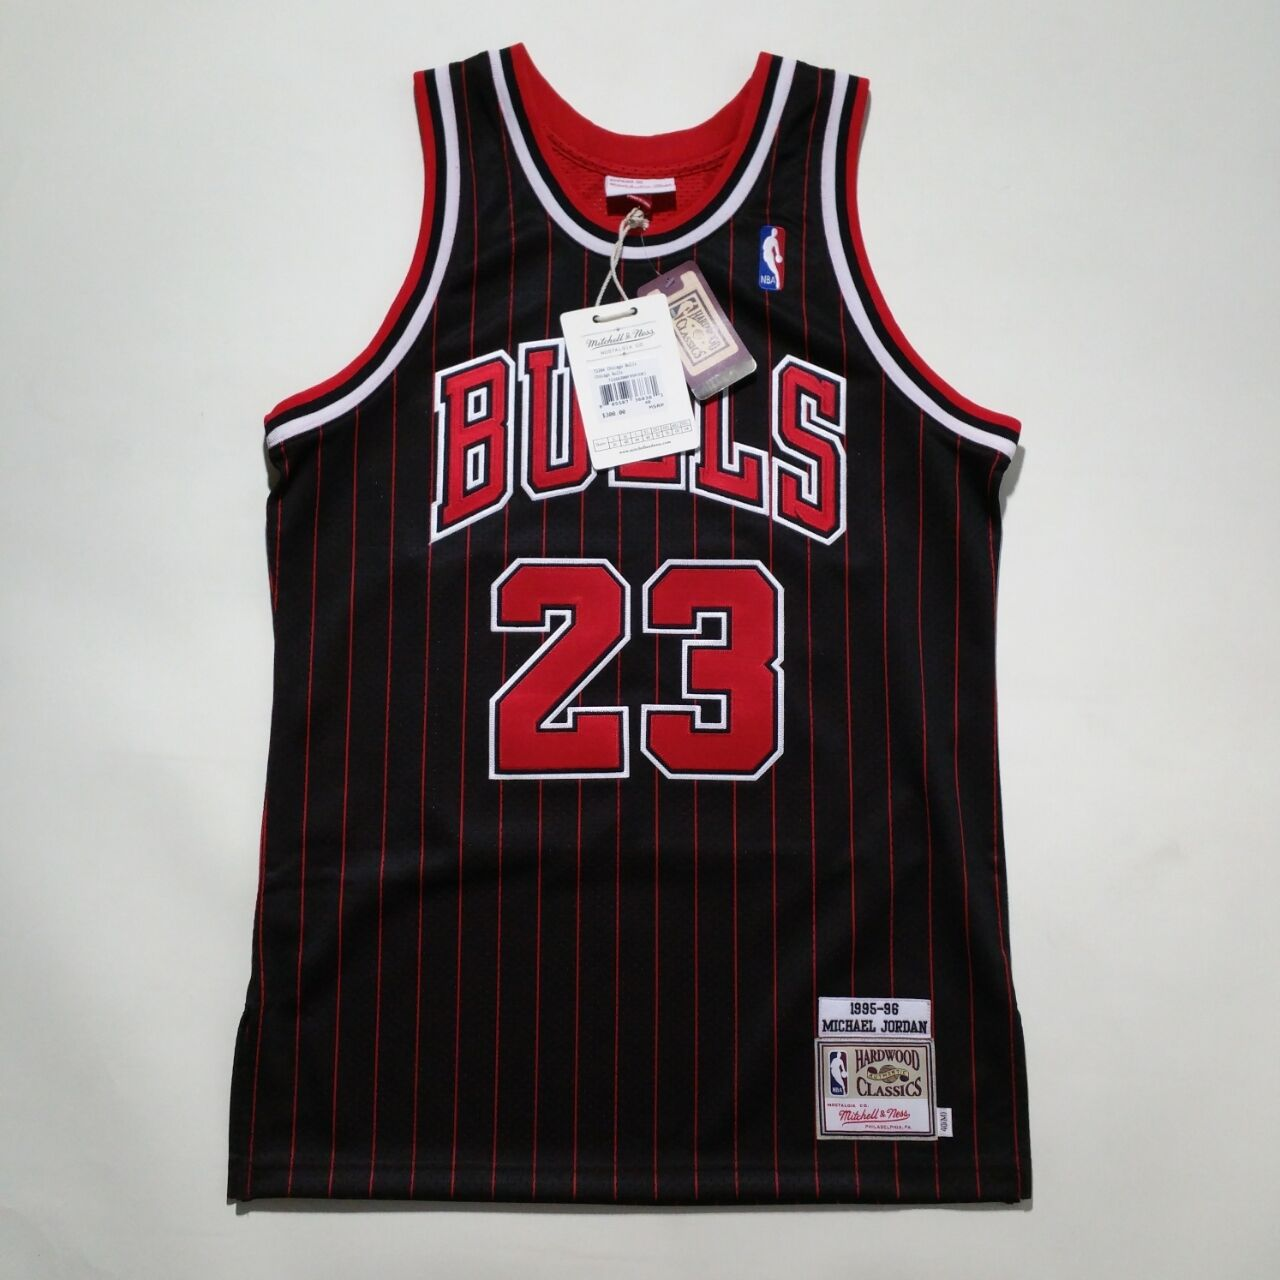 100% Authentisch Michael Jordan Jordan Jordan Mitchell & Ness Nadelstreifen 95 96 Bulls Trikot c69831